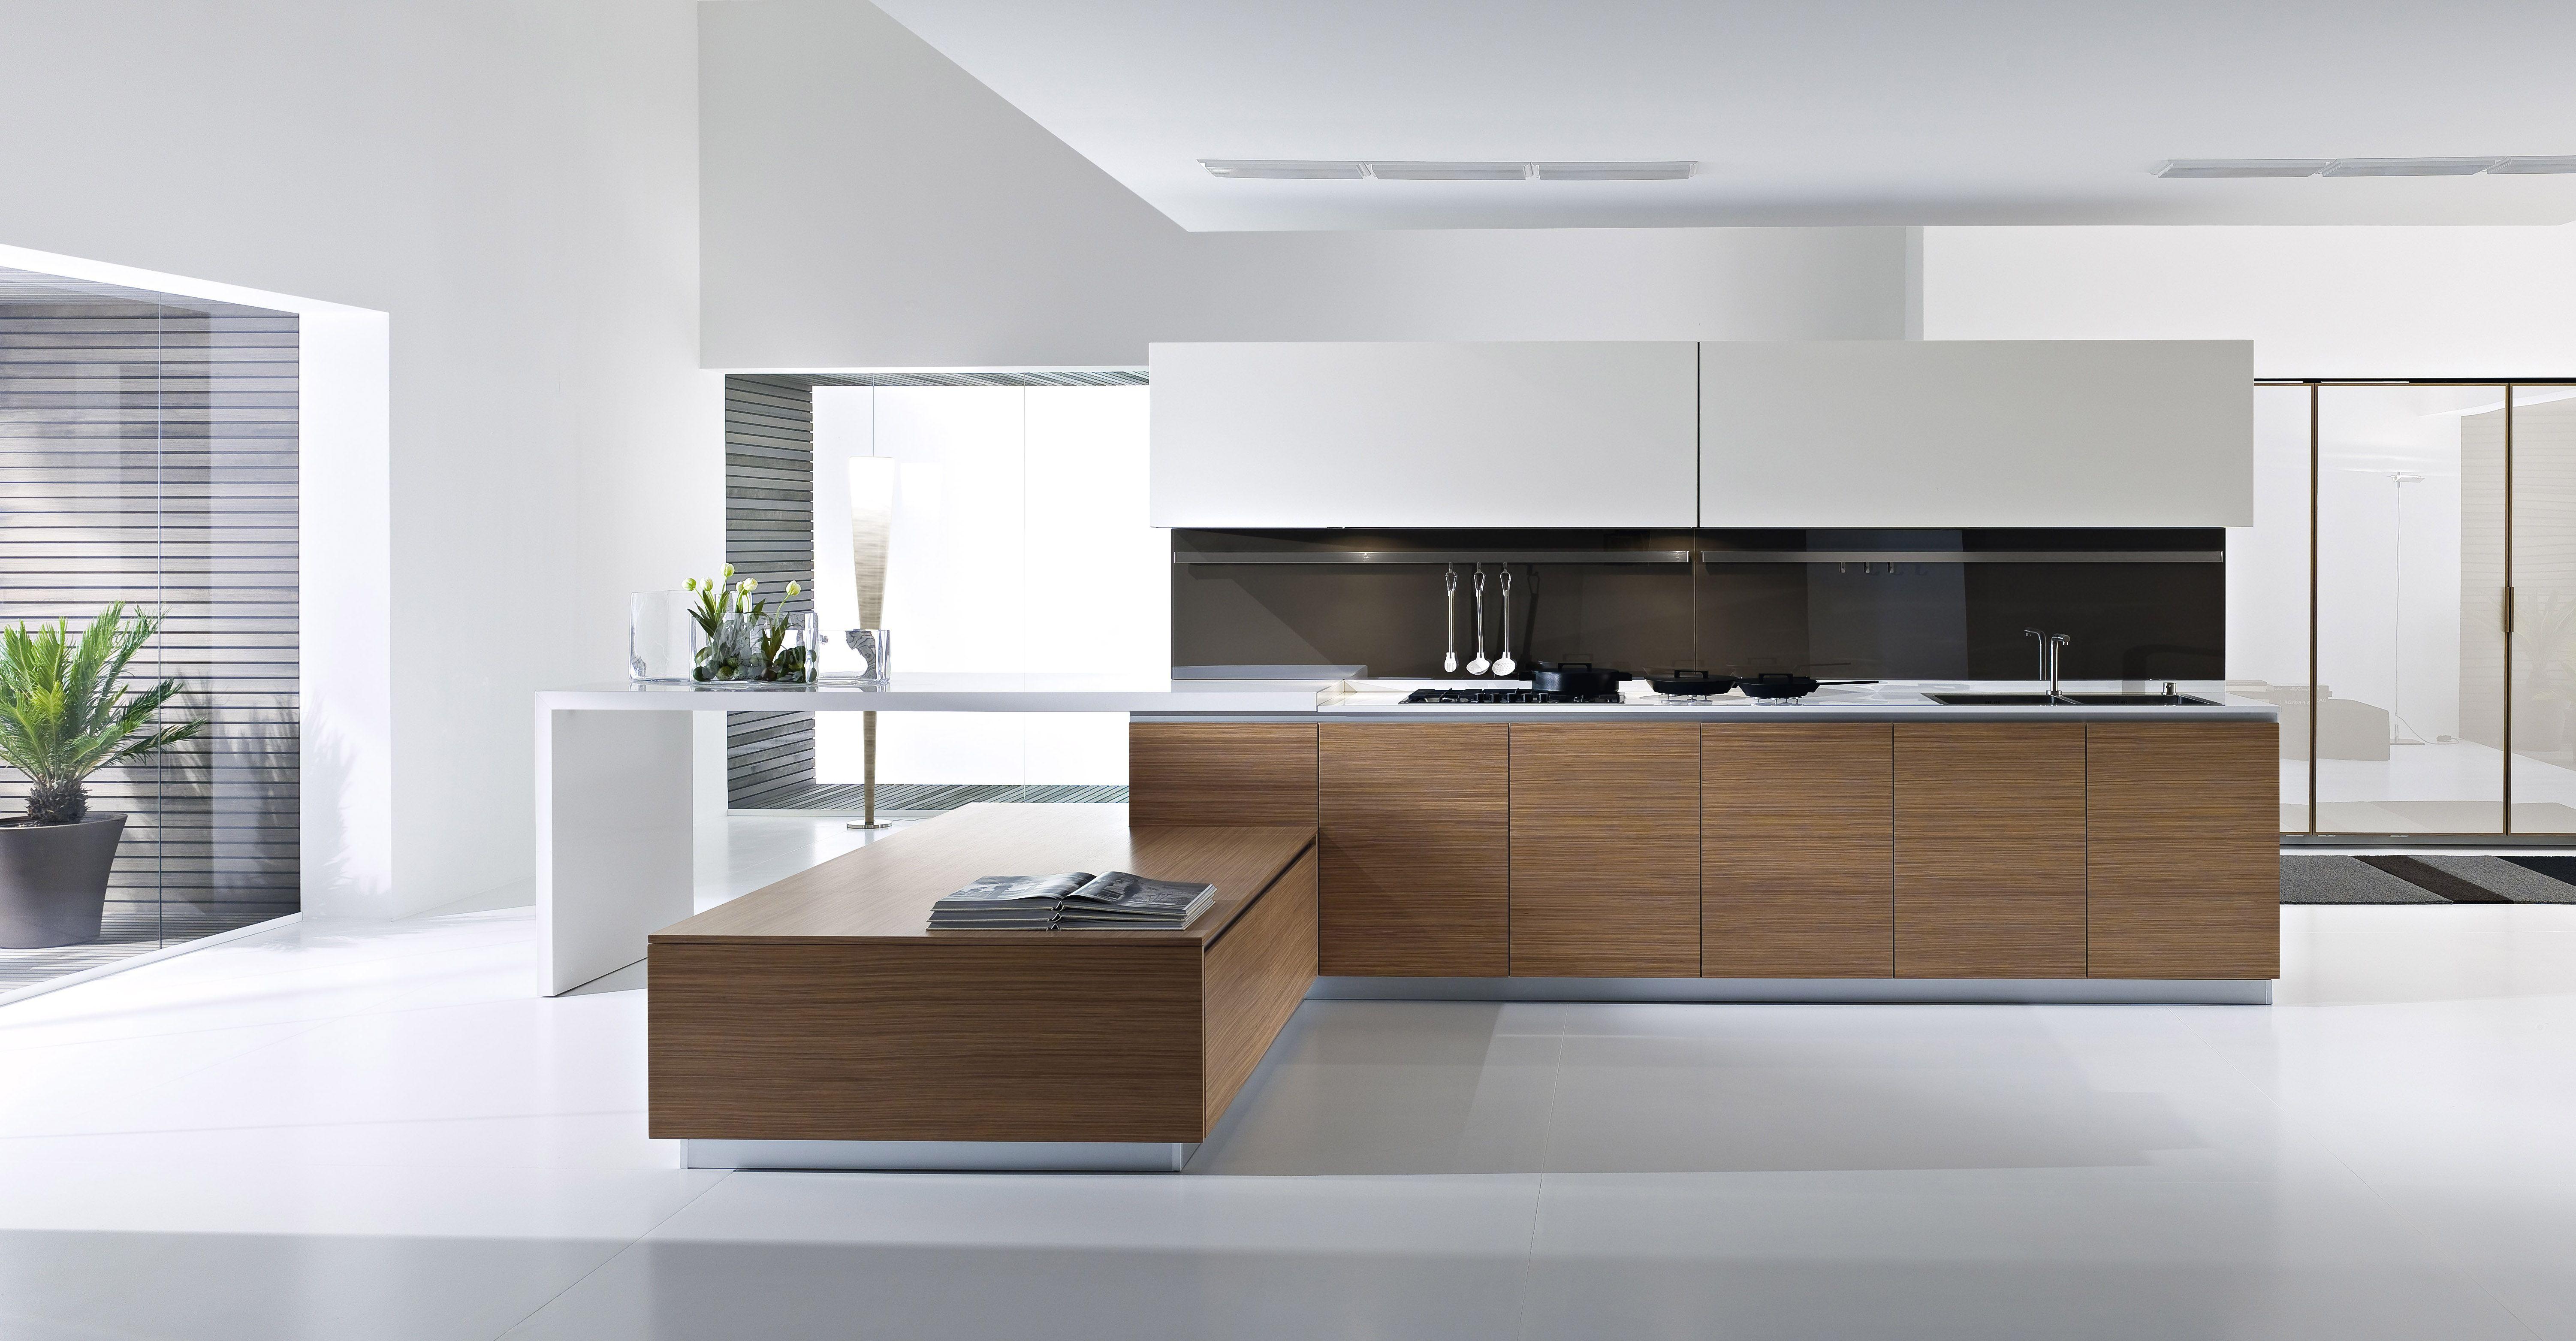 Pin By Pedininyc Kitchens On Kitchen Cabinet Contemporary Kitchen Cabinets Modern Kitchen Design Italian Kitchen Design